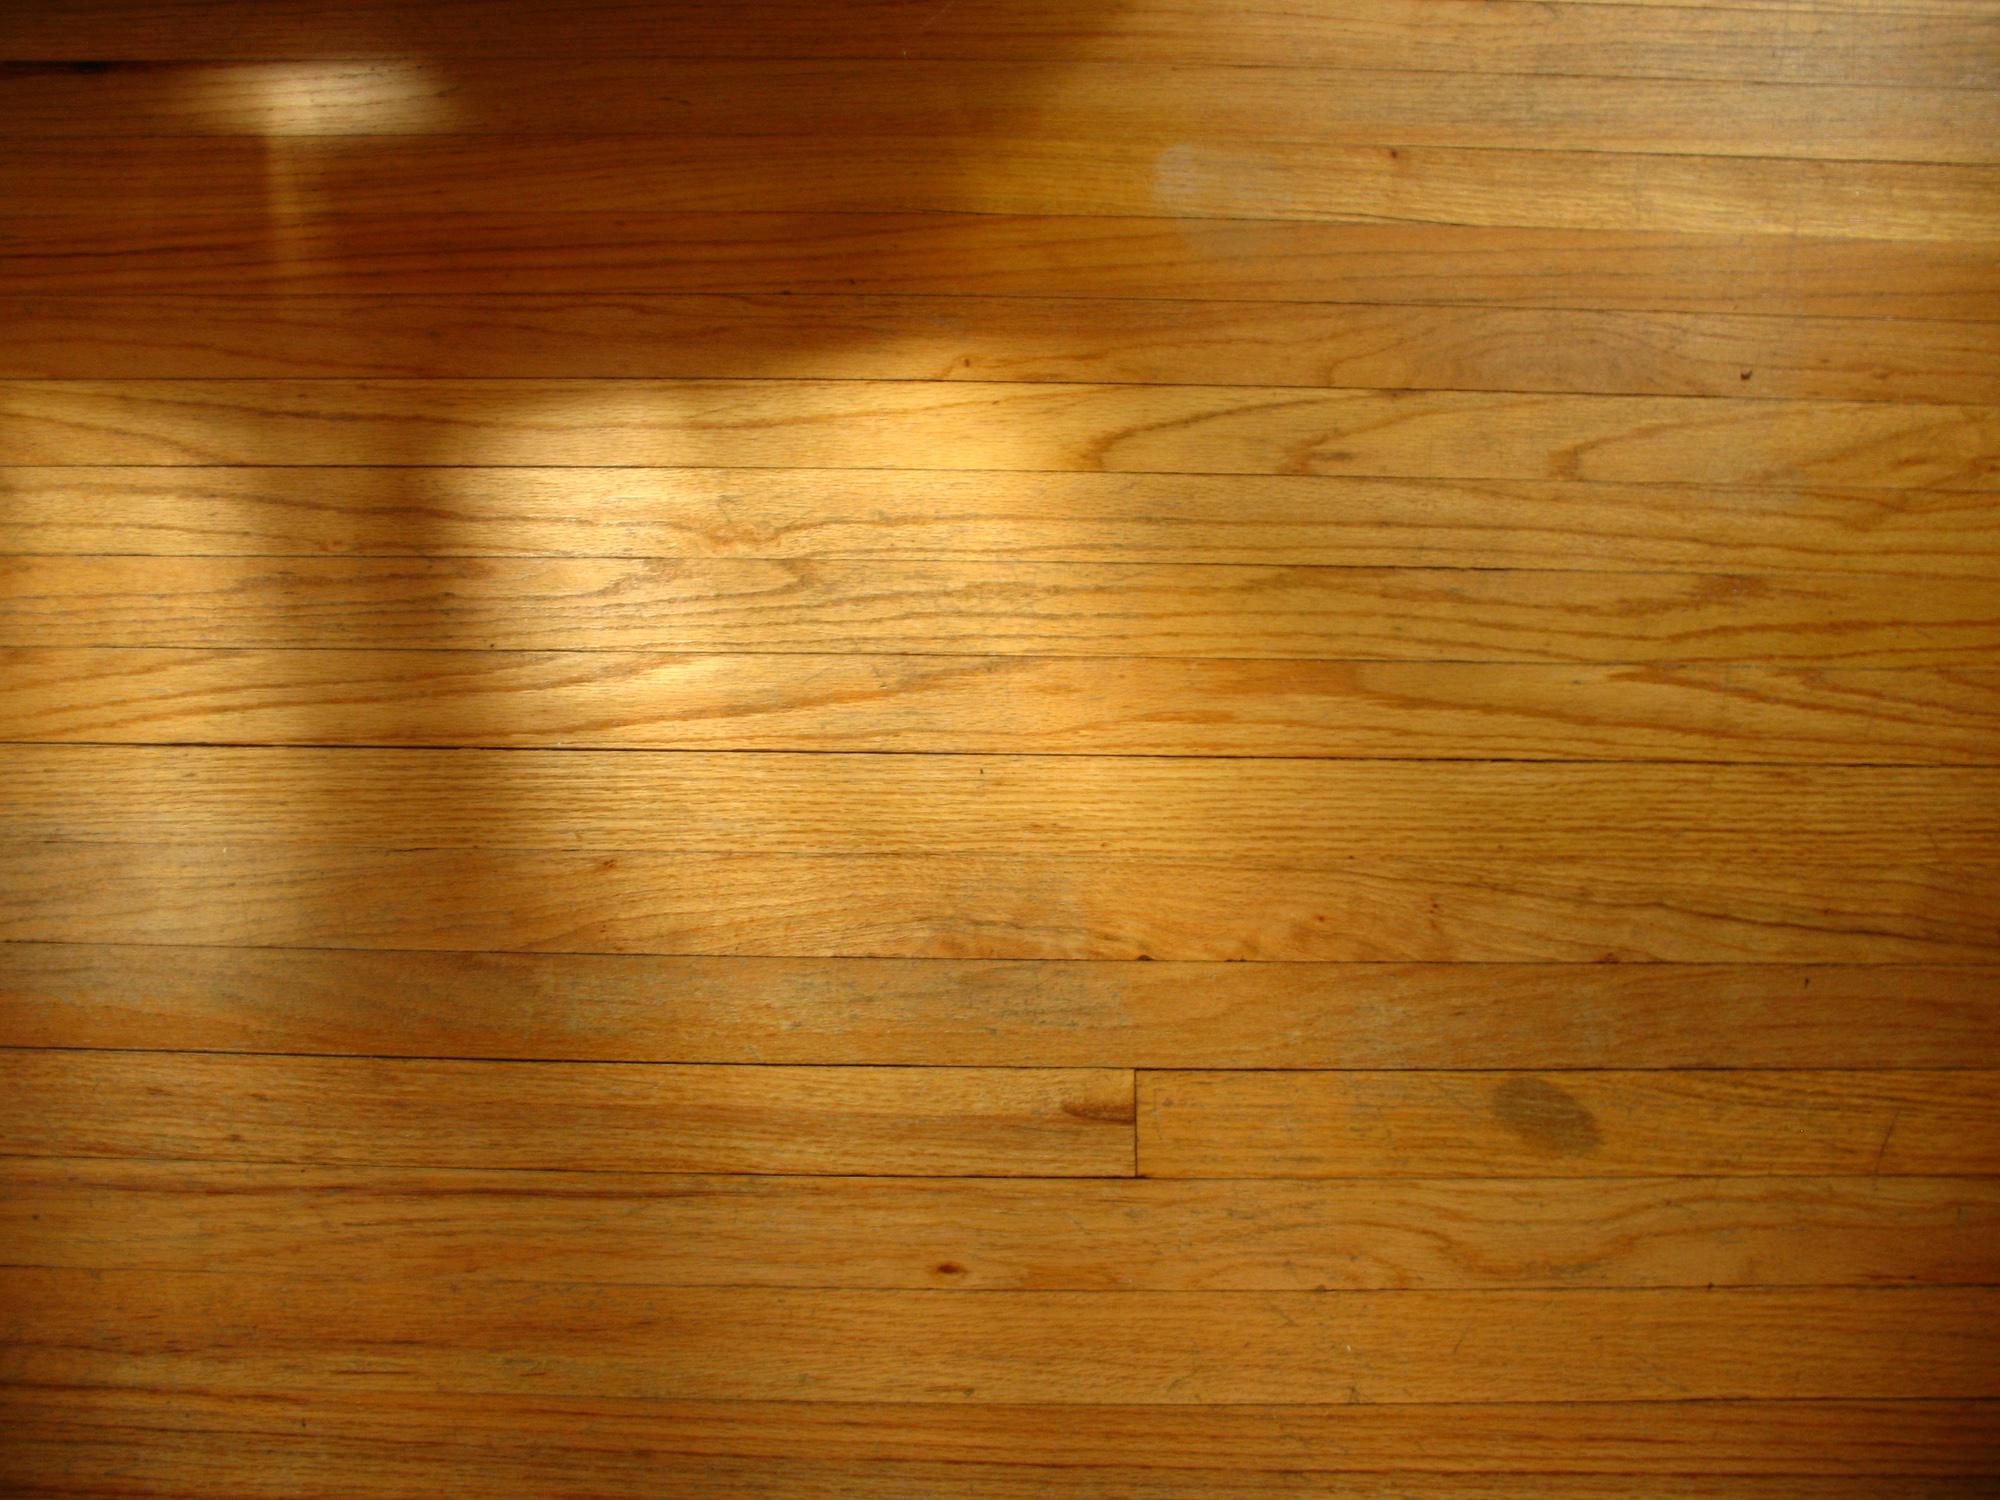 Hardwood Floor By Eirastock On Deviantart